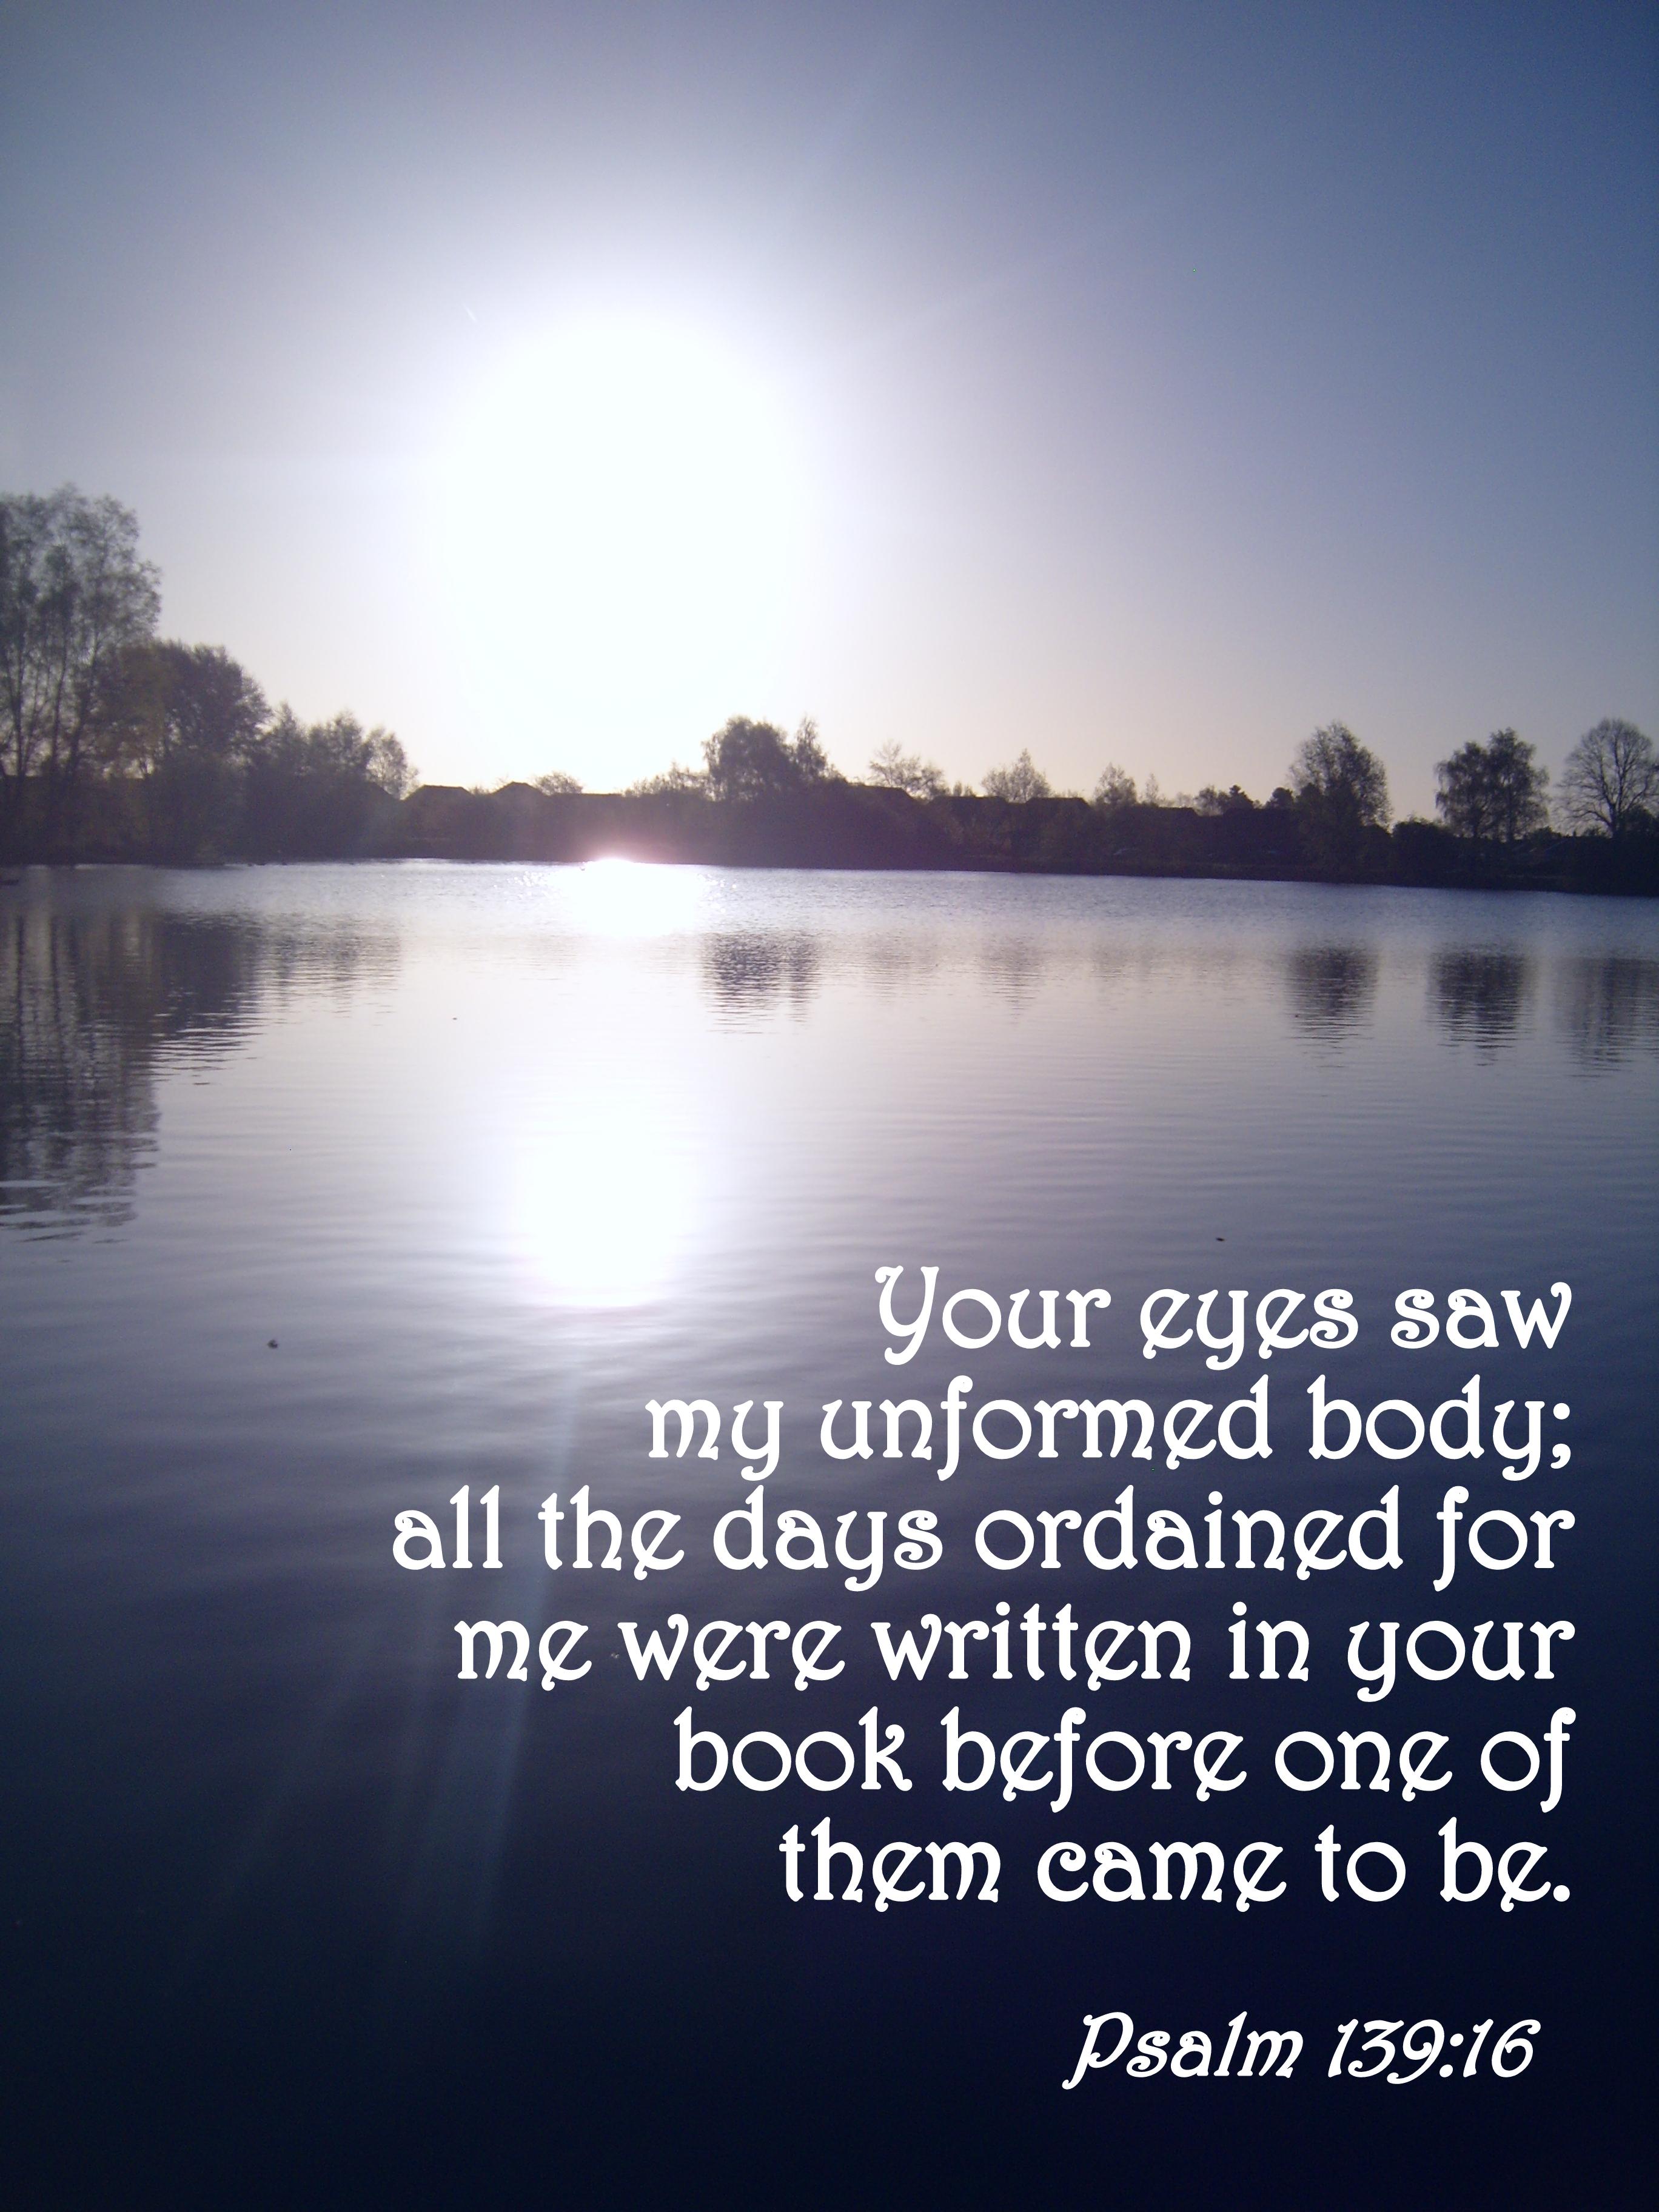 psalm 139 Psalm 139 in asl youplaceyourhandofblessingonmyhead verse6suchknowledgeistoo wonderfulforme,toogreatformetounderstand verse7icanneverescape.